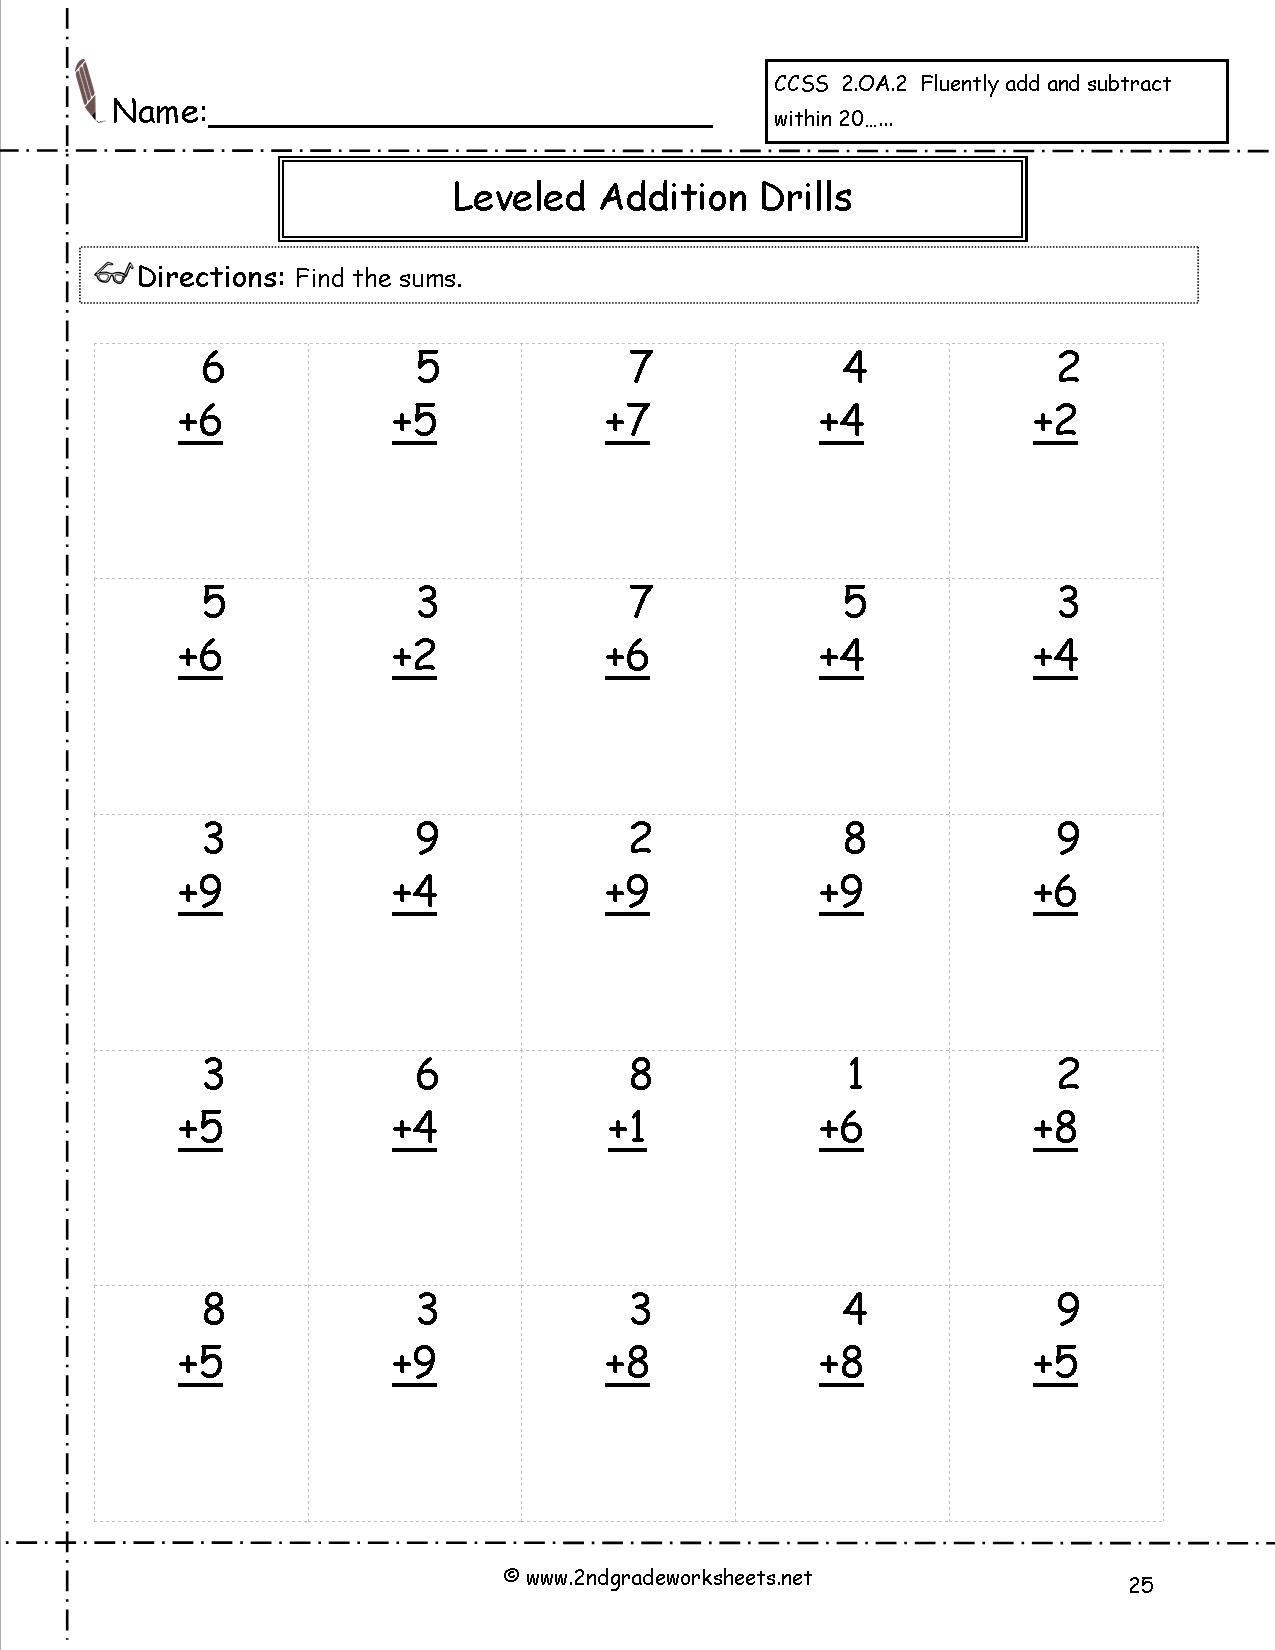 Free Math Worksheets And Printouts | Free Printable Second Grade Math Worksheets